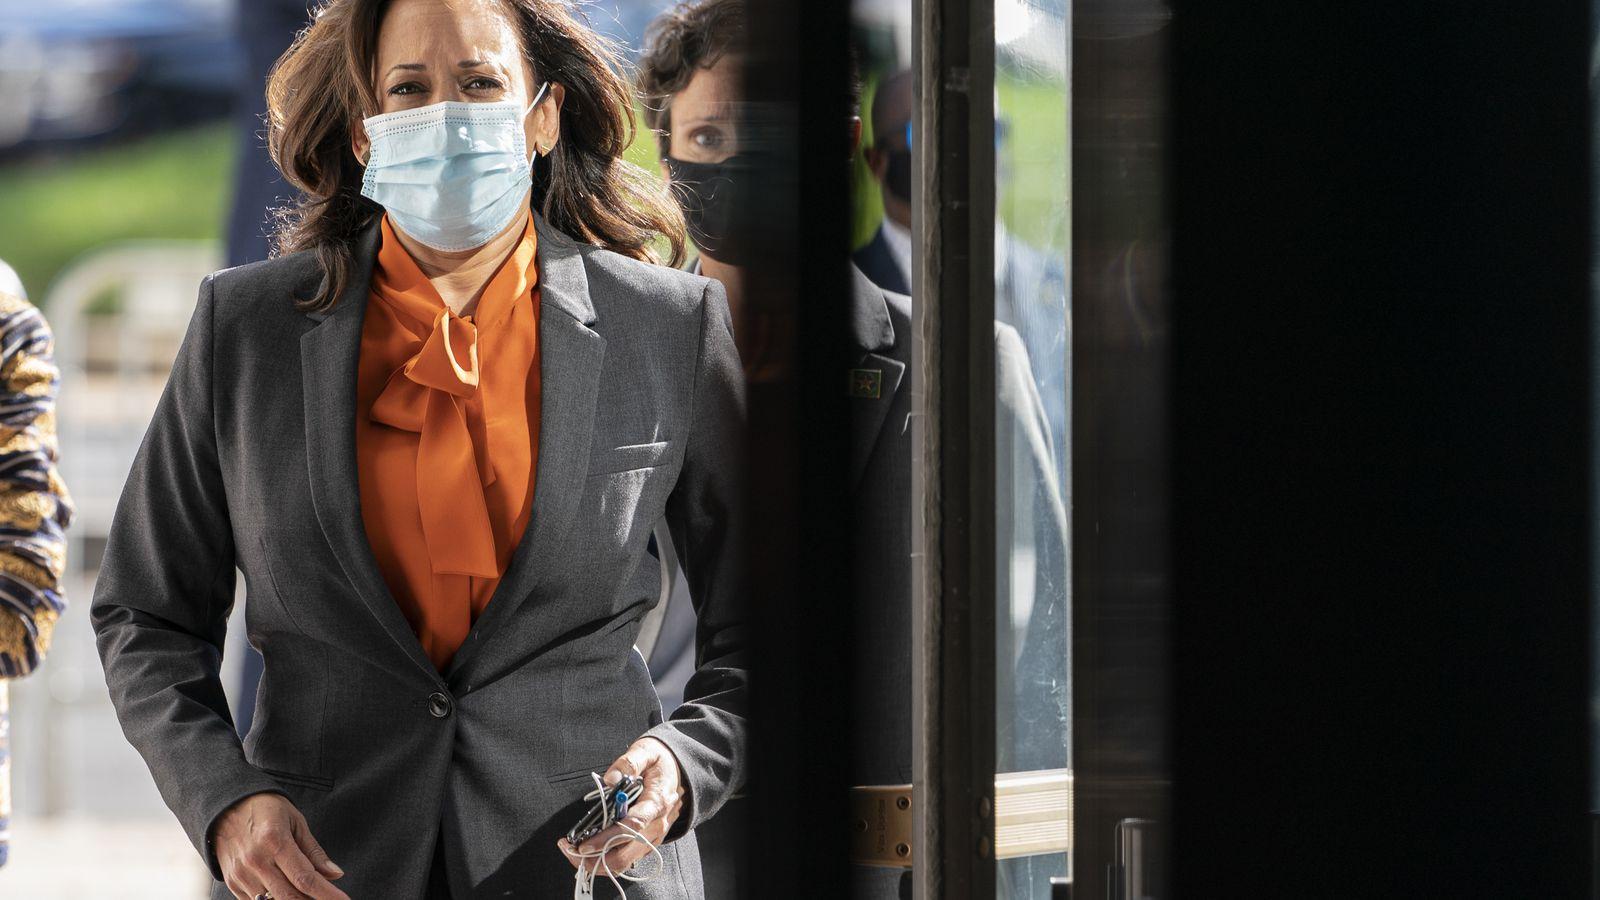 Kamala Harris Suspends Travel After Staffer Tests Positive For The Coronavirus